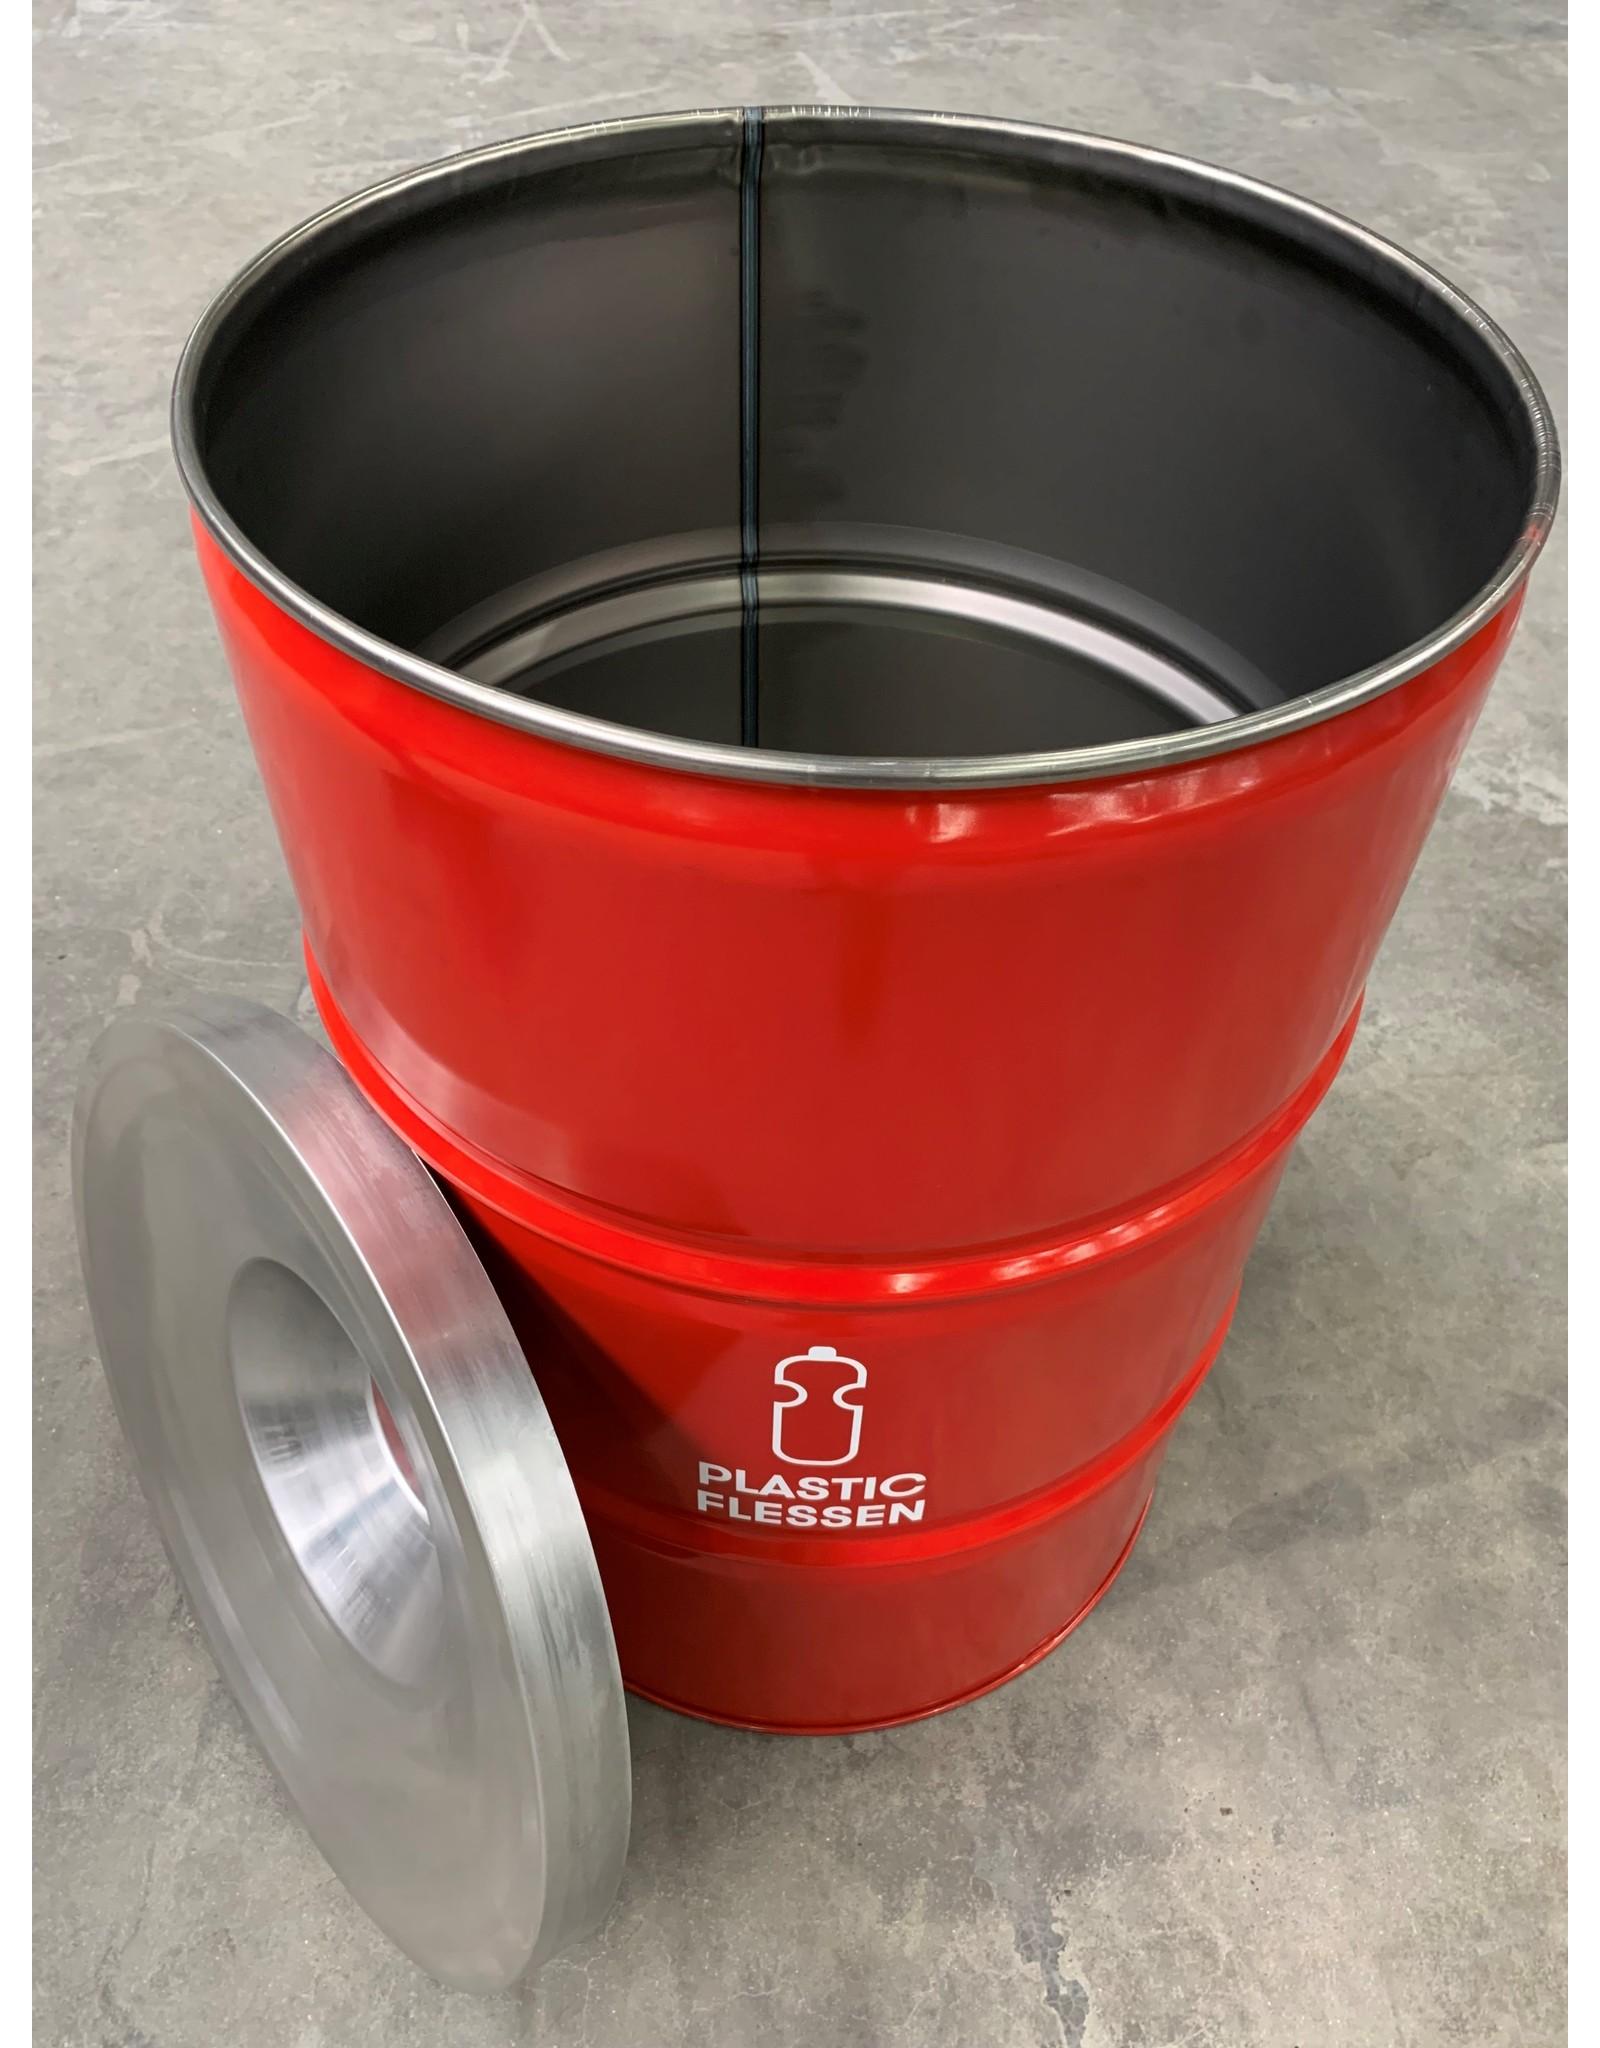 Barrelkings BinBin Flame Red 200L Plastikflaschensammlung Mülleimer